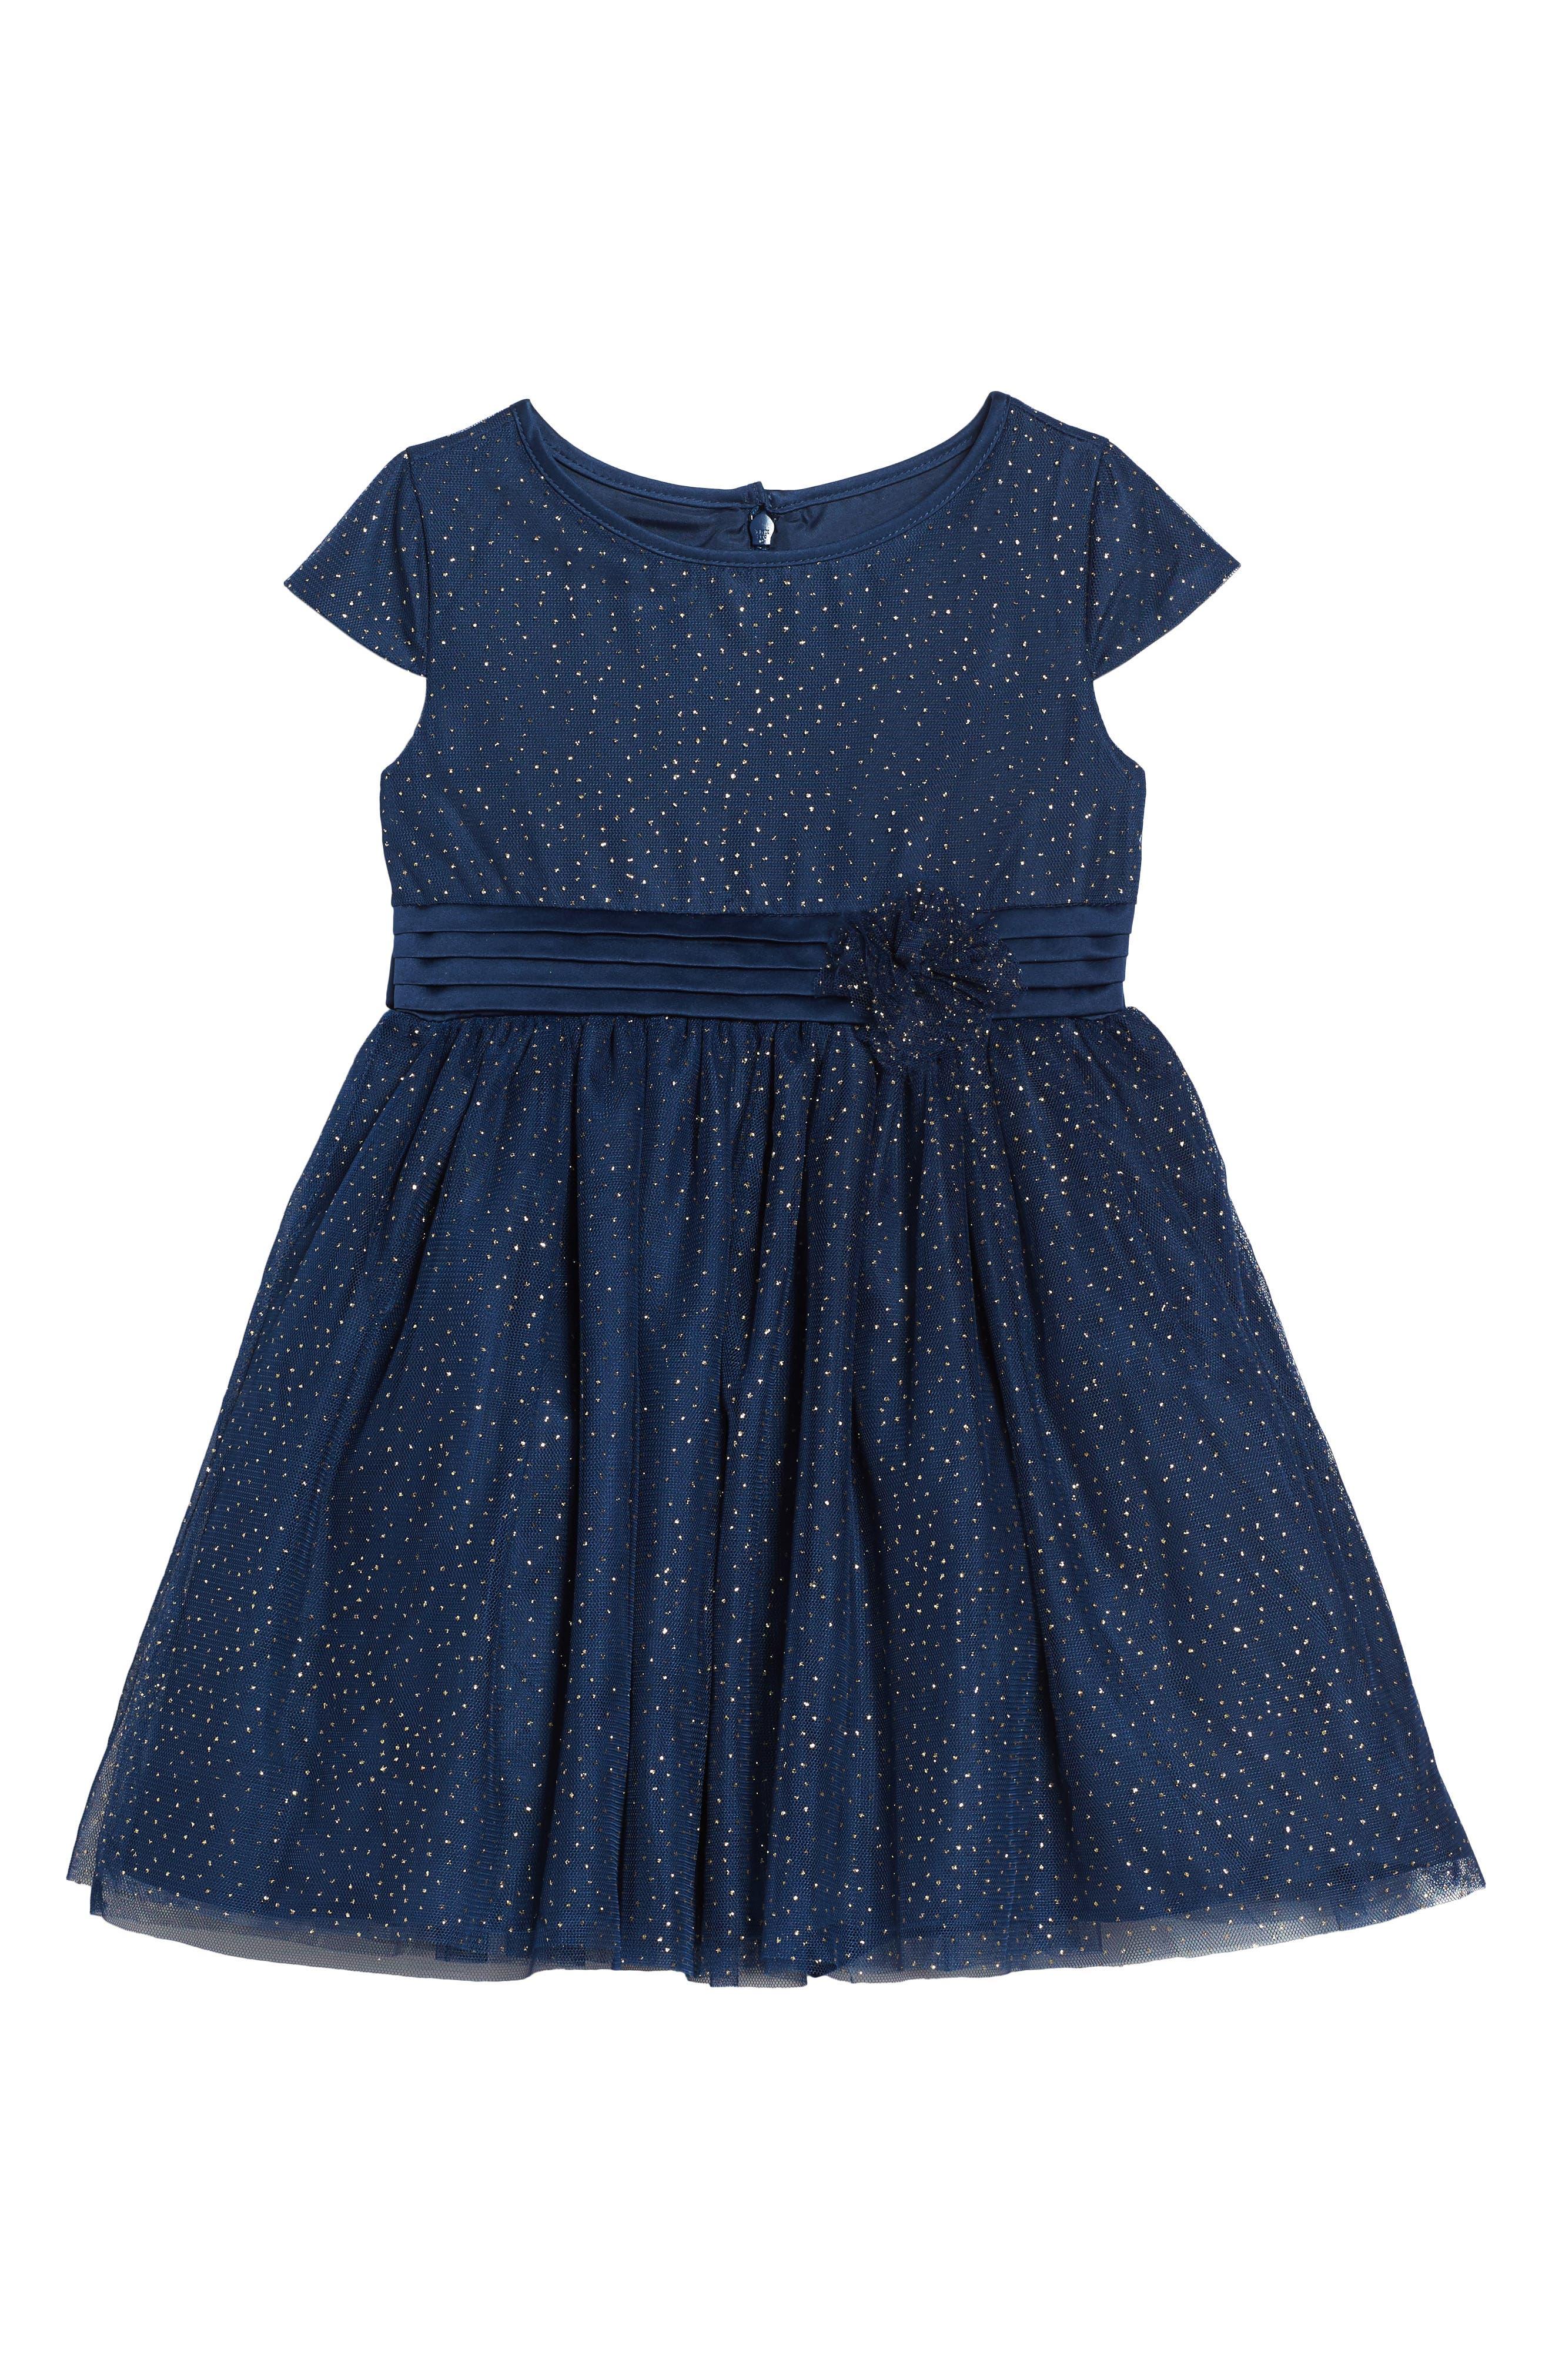 Main Image - Little Angels Illusion Mesh Party Dress (Toddler Girls & Little Girls)